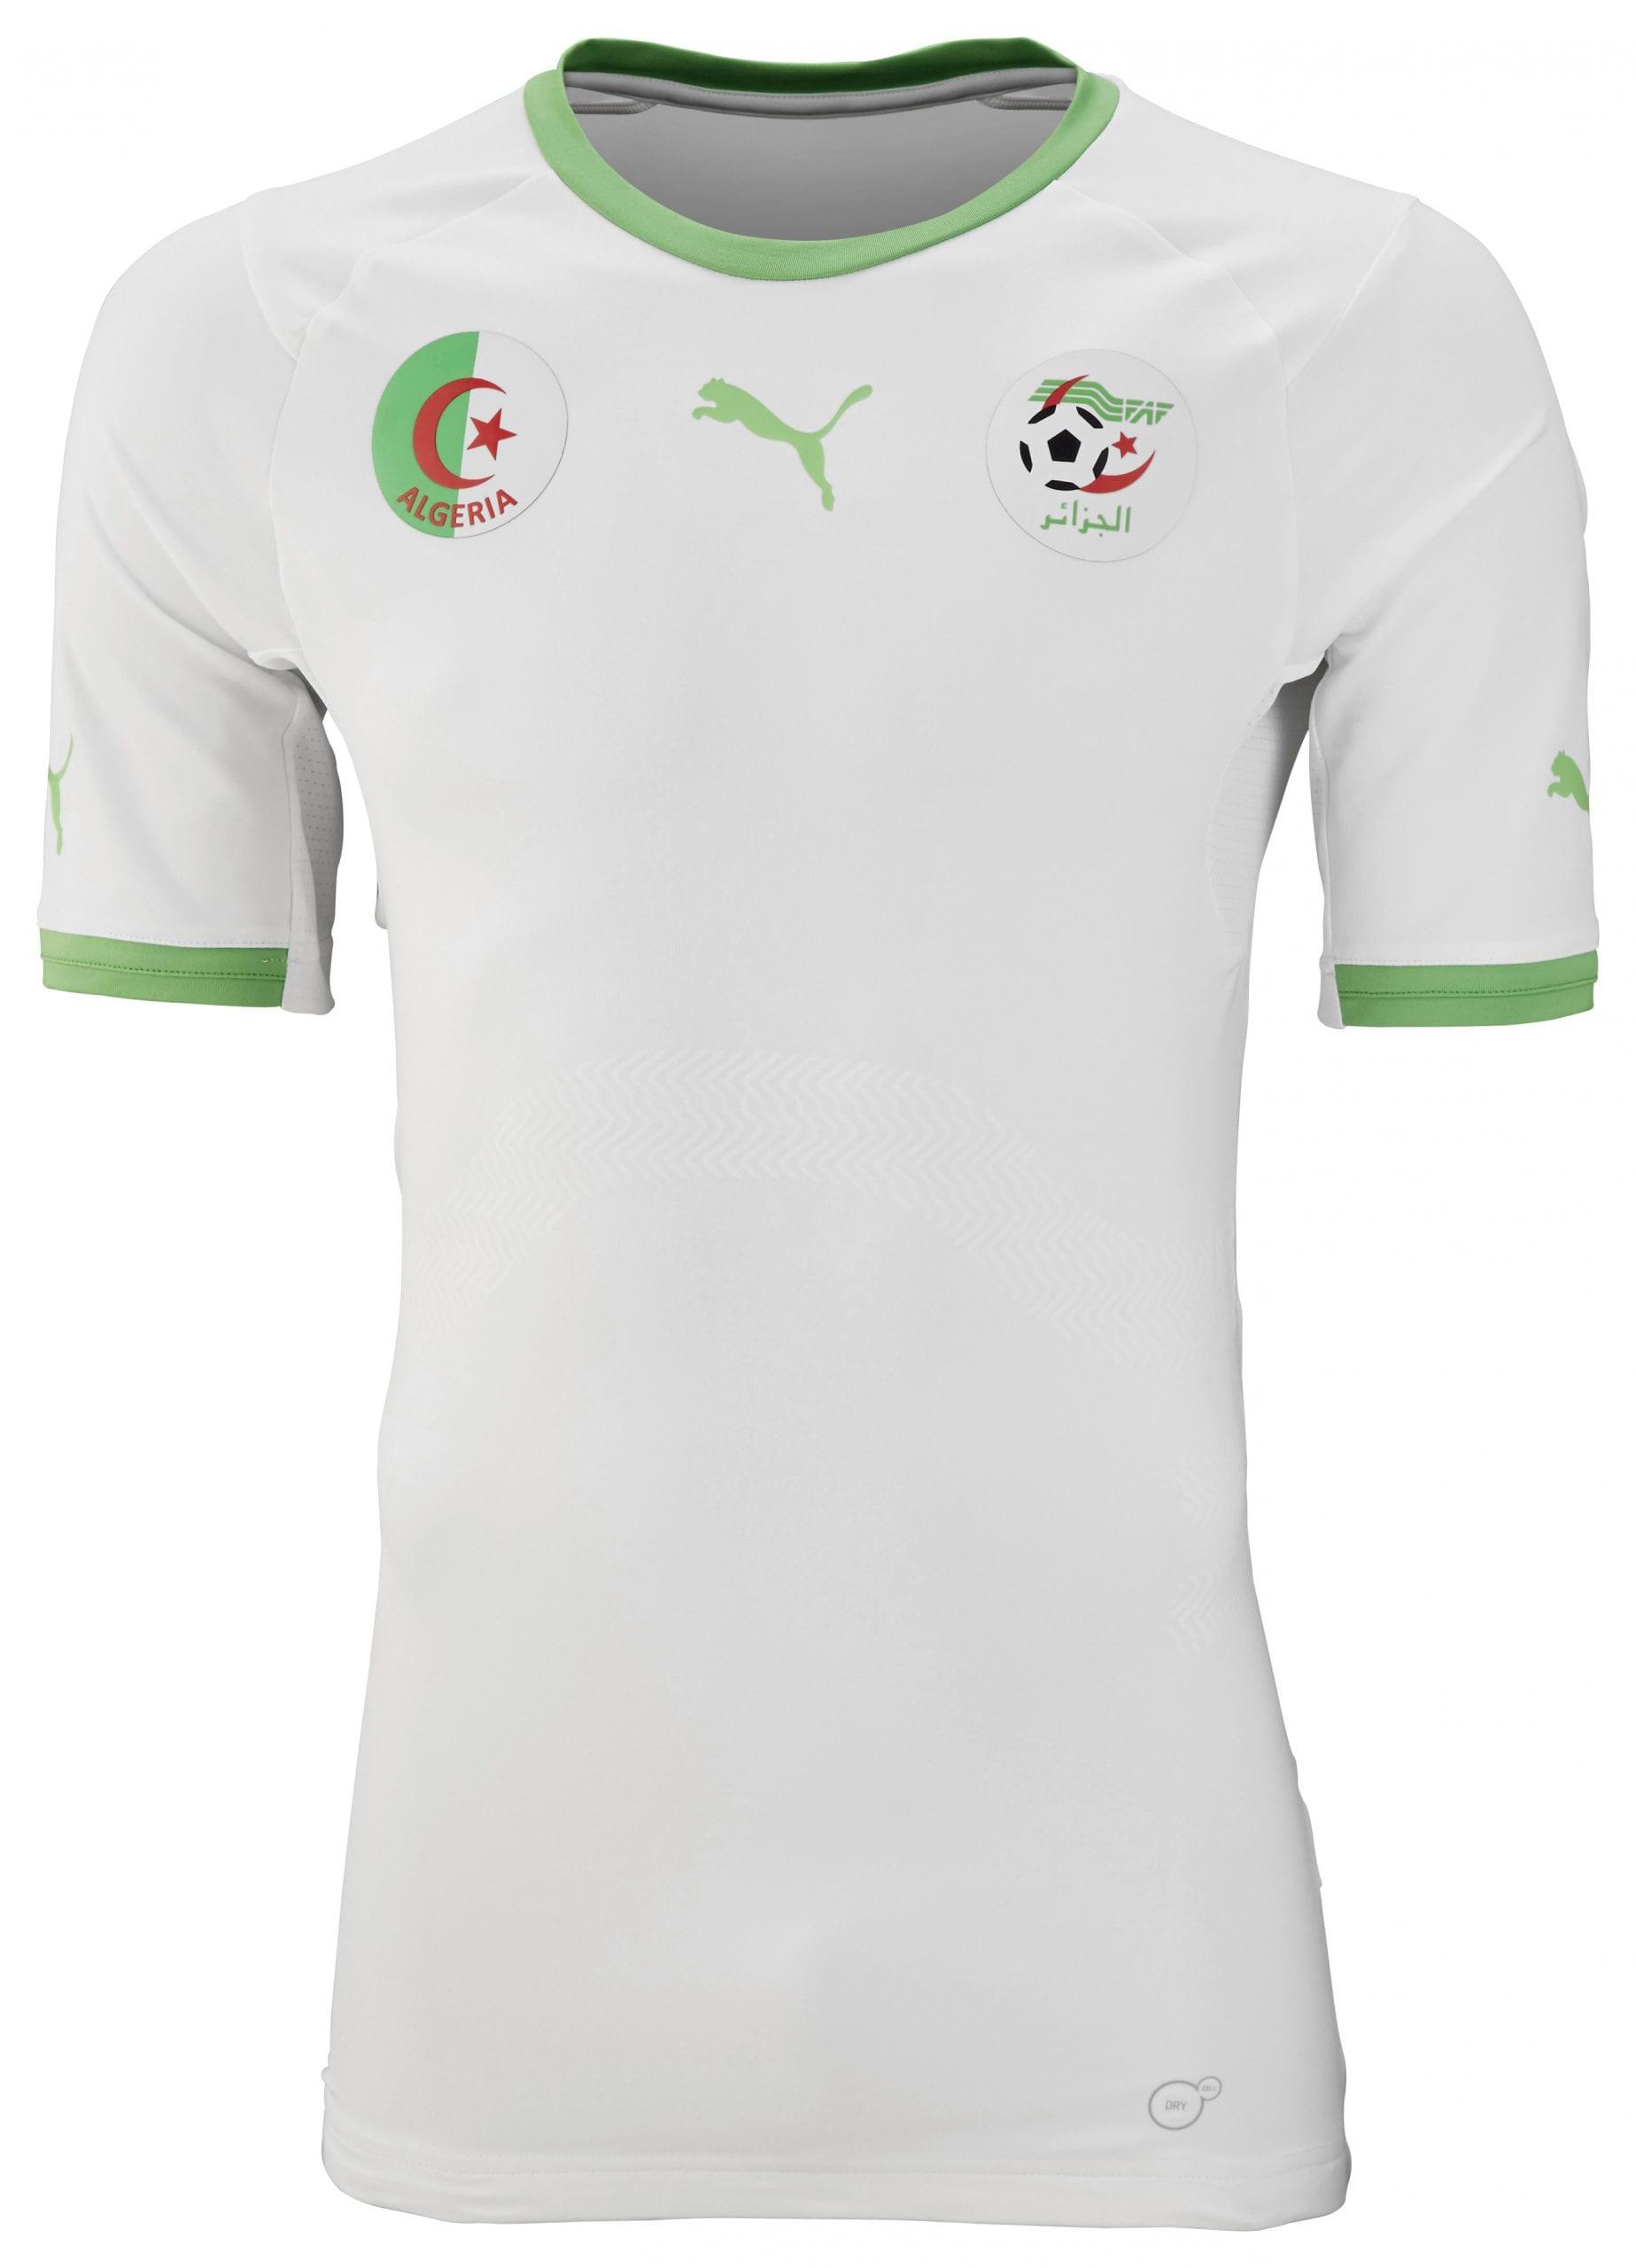 SS14 Algeria Home Promo ACTV Jersey_744601_01